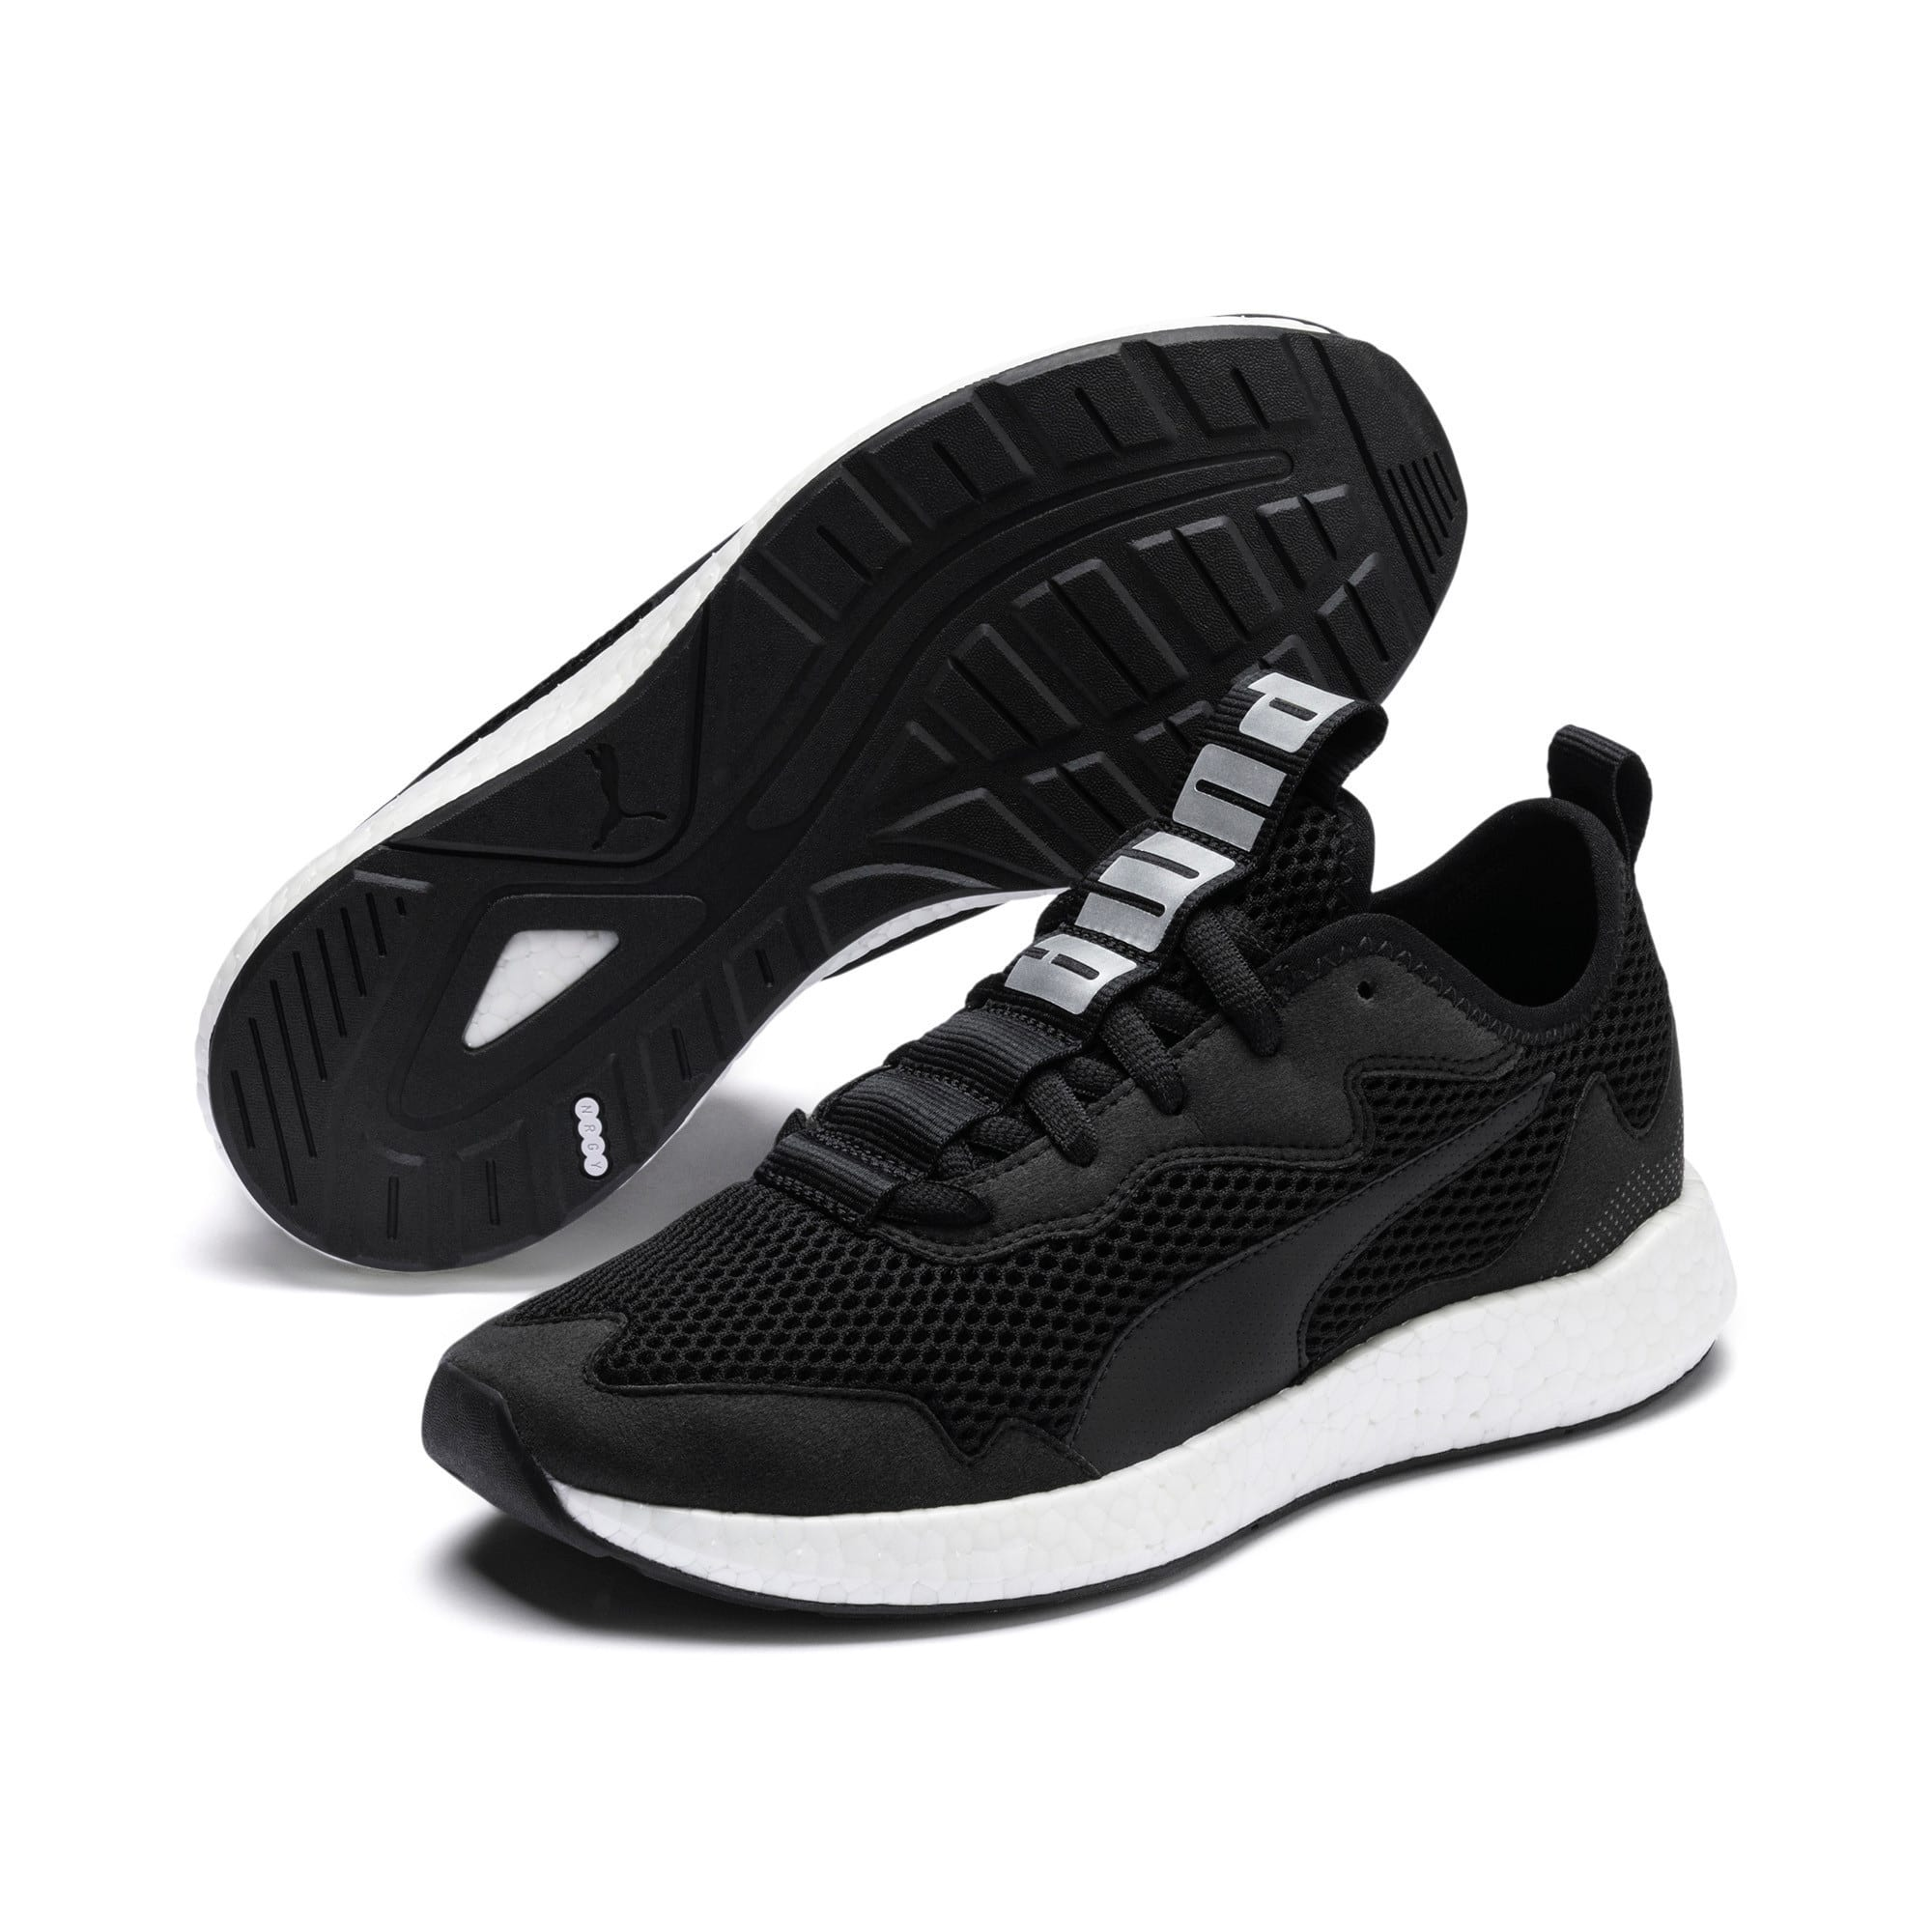 Thumbnail 8 of NRGY Neko Skim Women's Running Shoes, Puma Black-Puma Silver, medium-IND